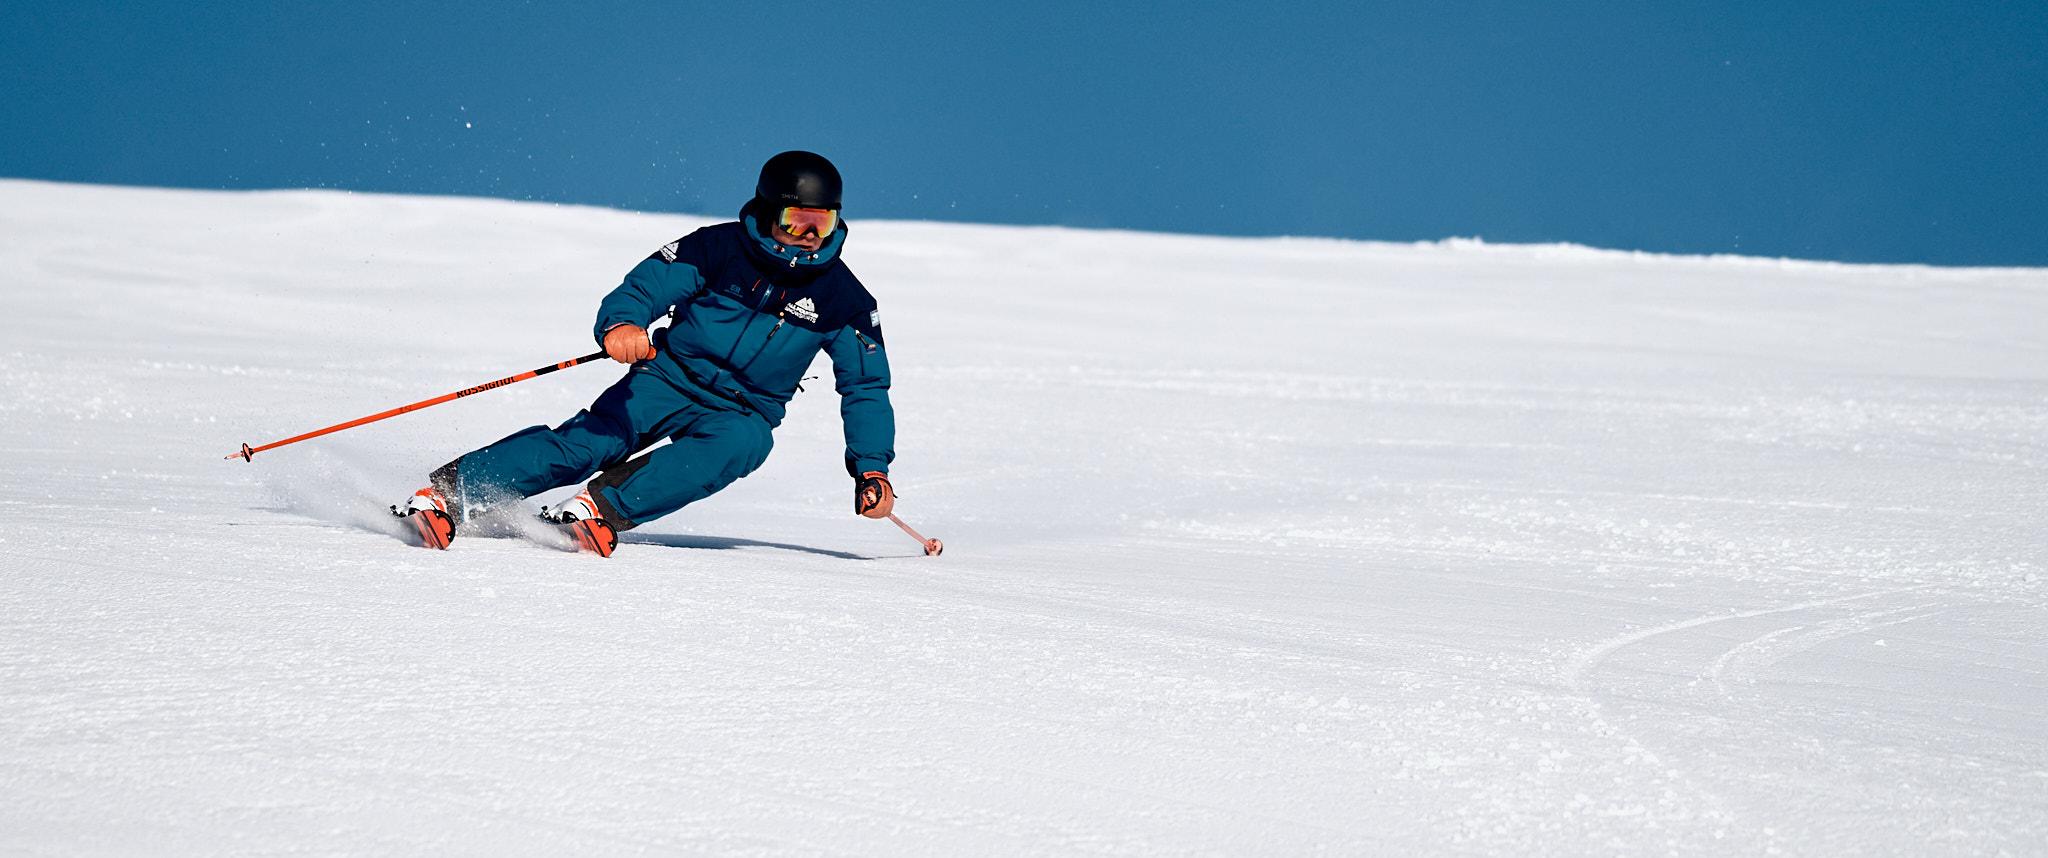 Ski Instructor Skiing